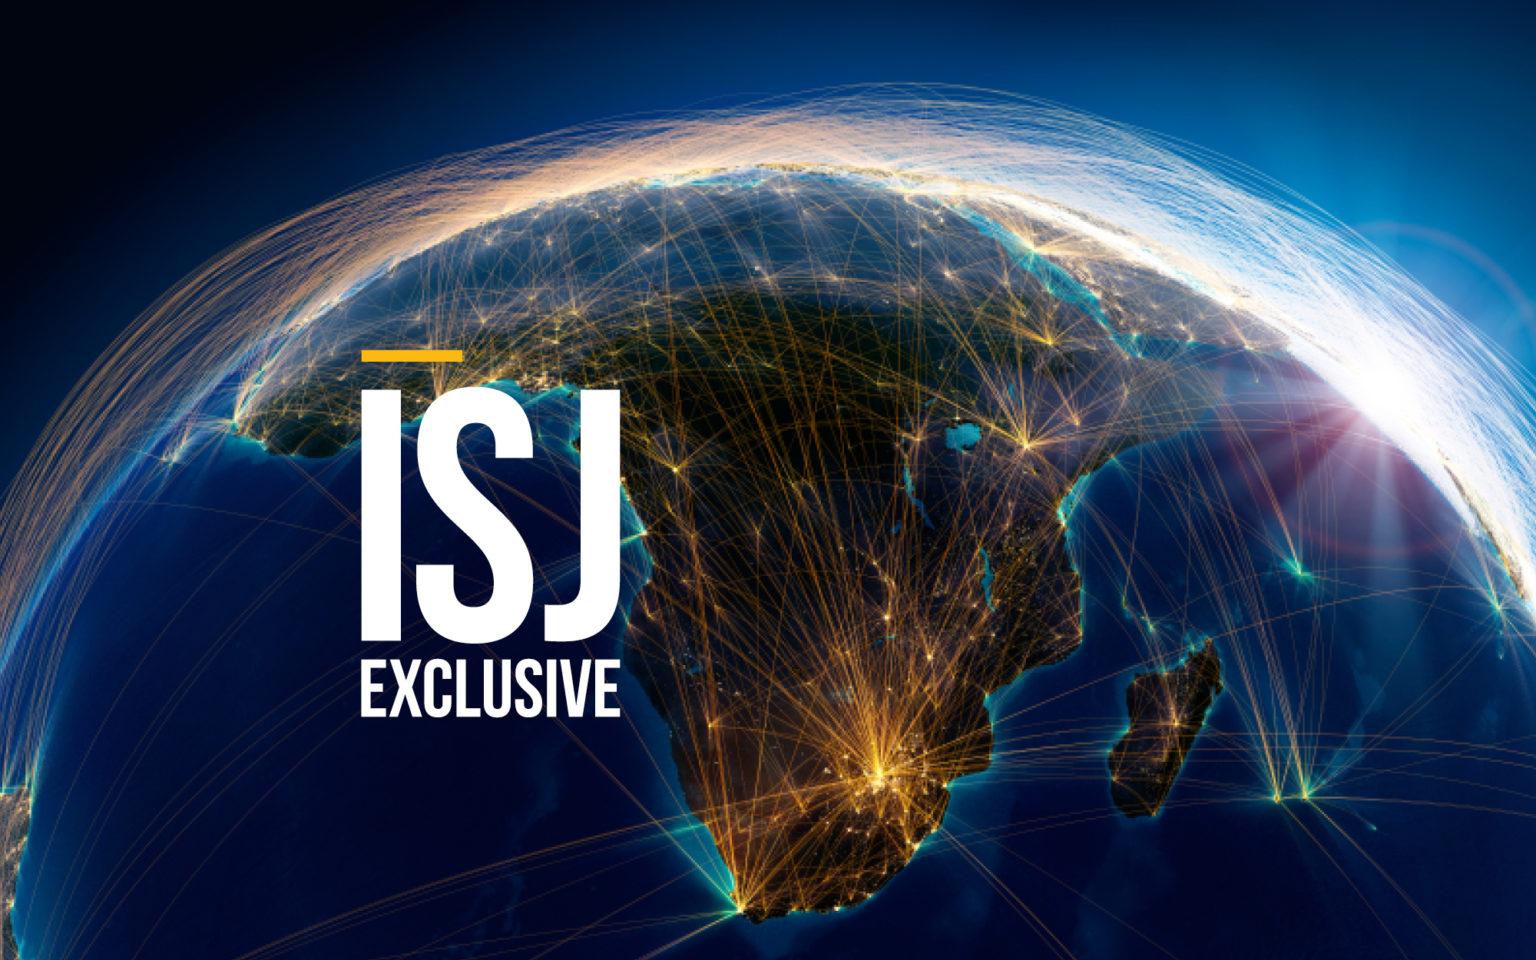 ISJ exclusive 1